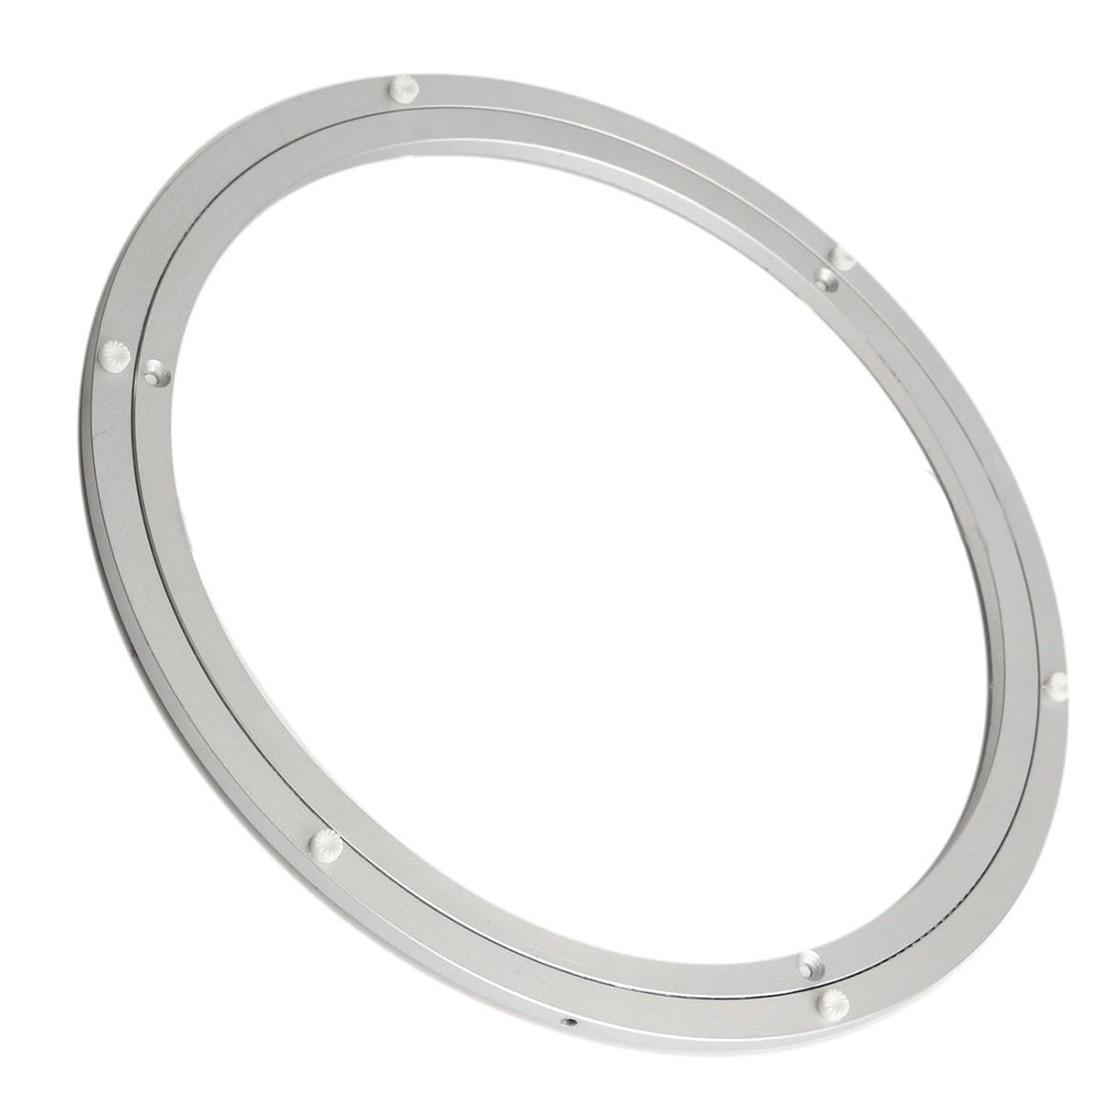 Aluminium Rotating Turntable Bearing Swivel Plate 18 Inch Silver